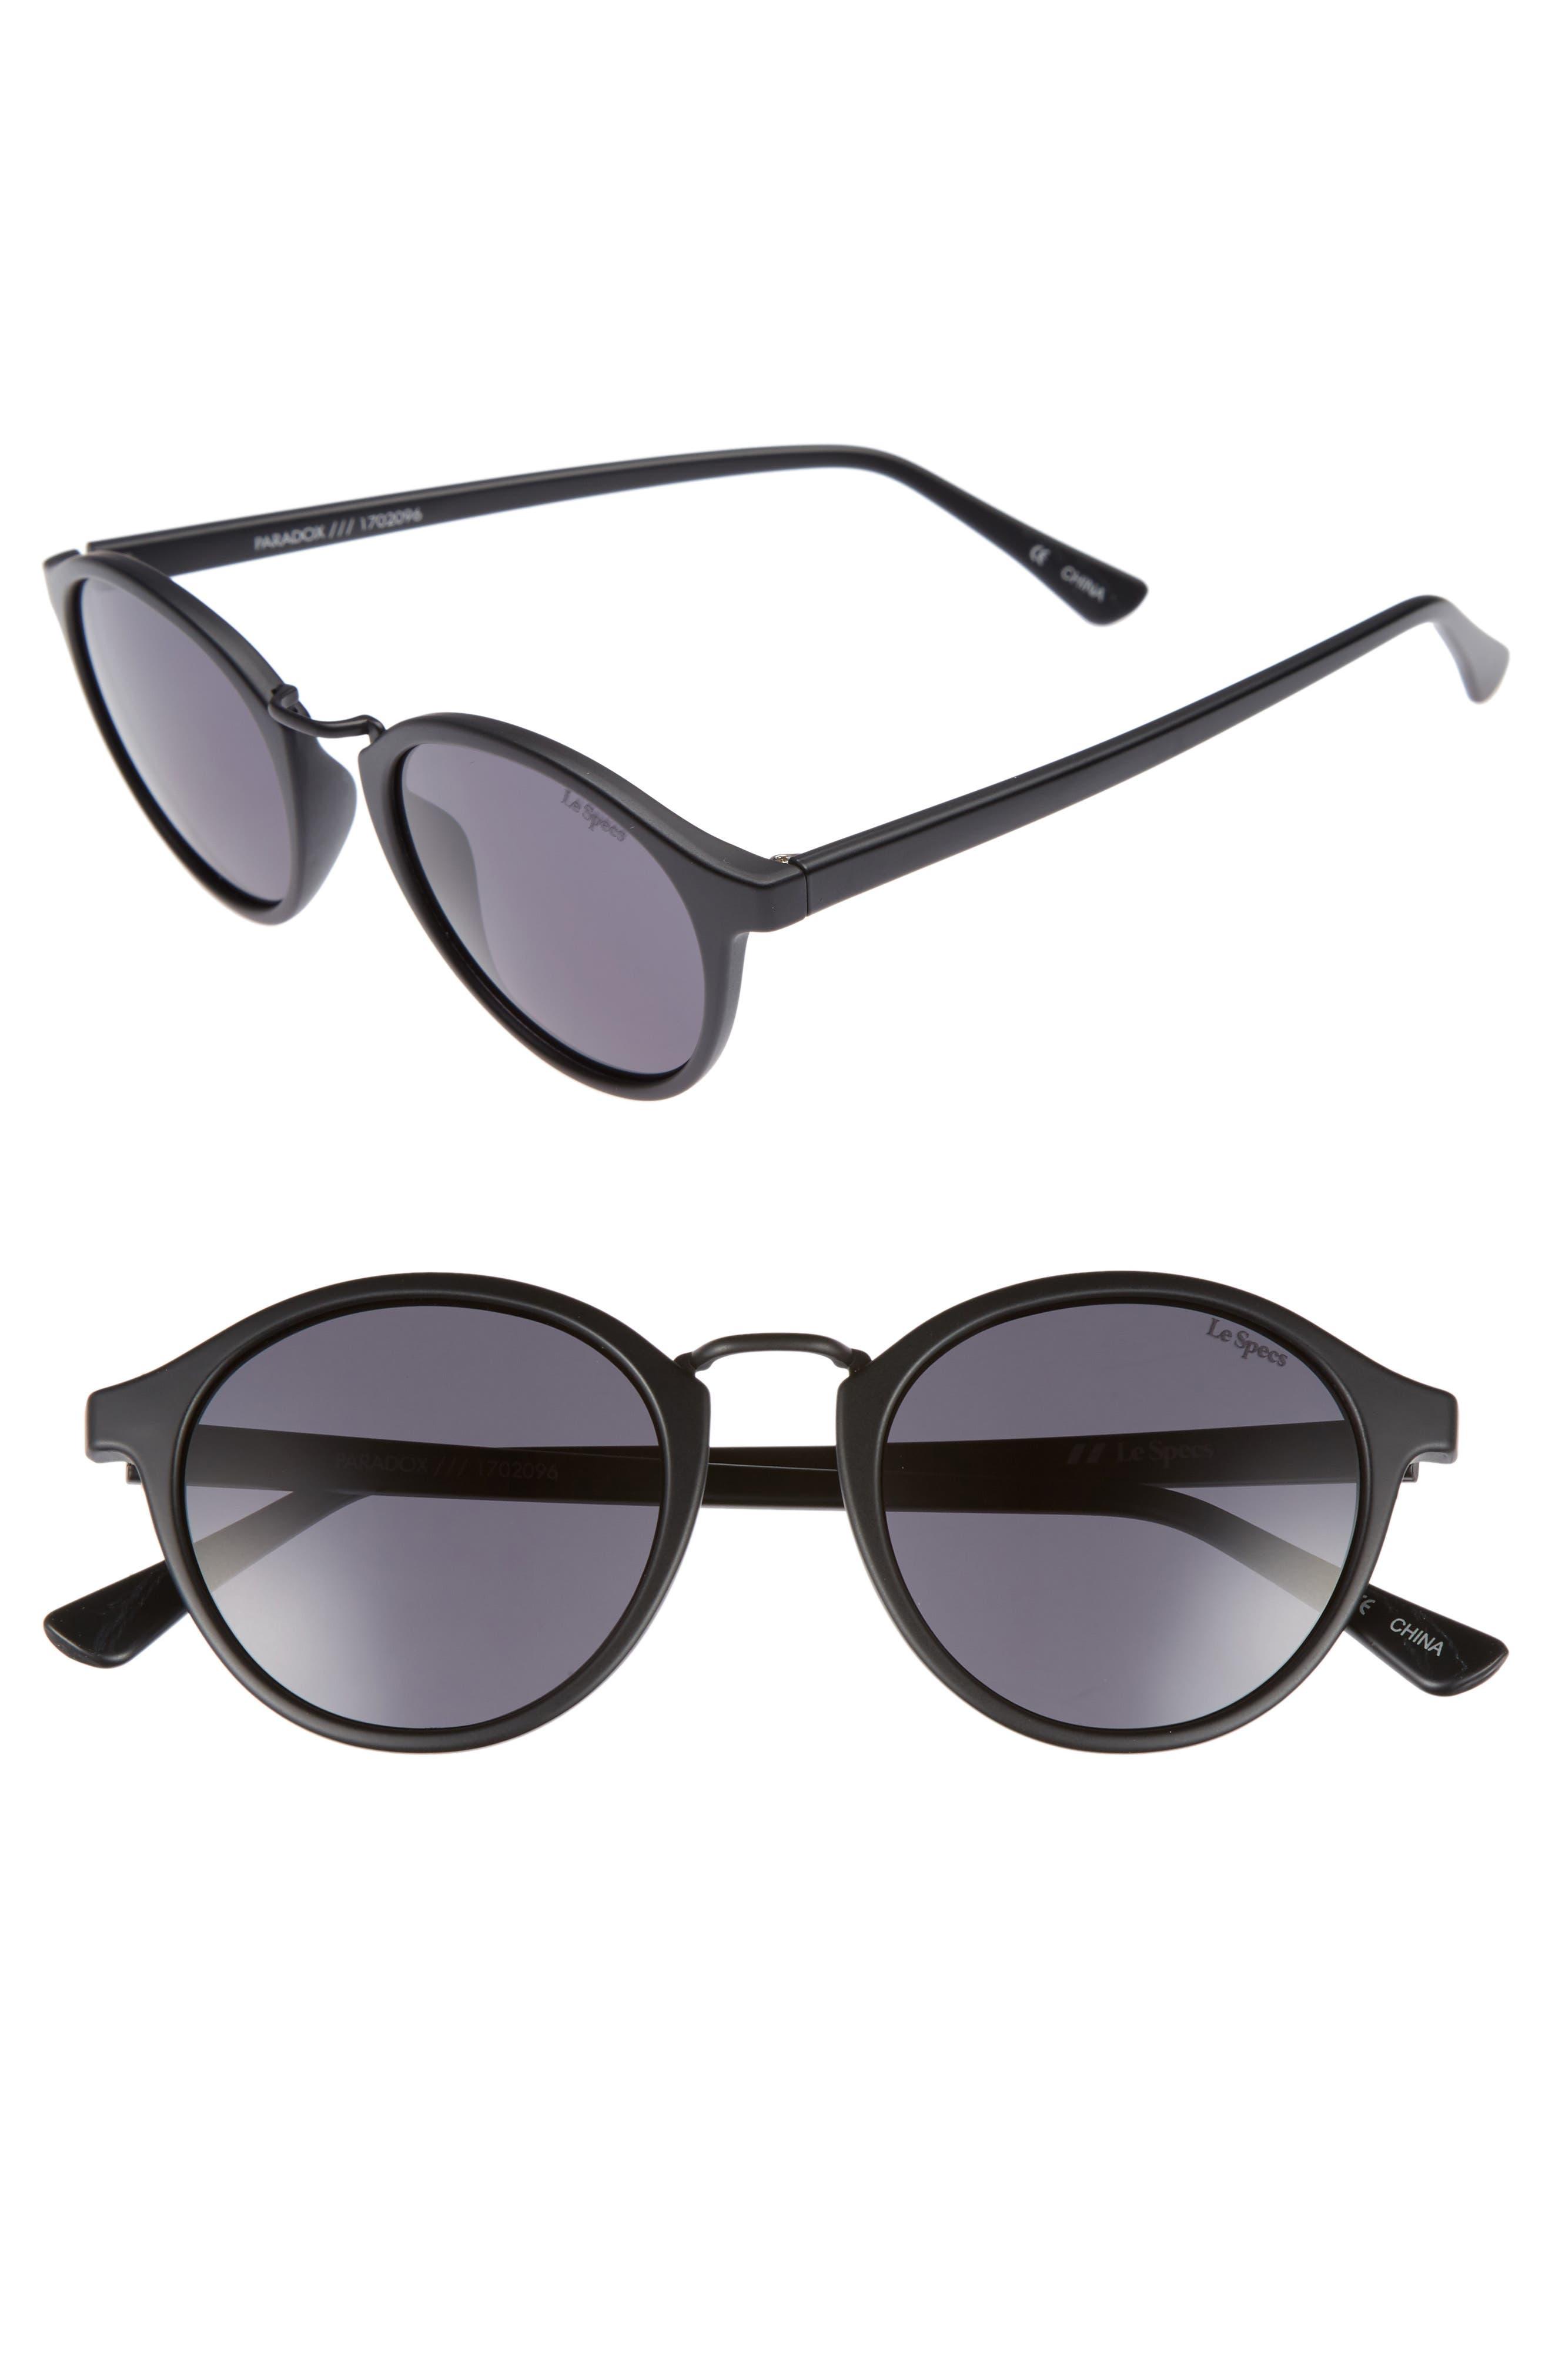 Paradox 49mm Oval Sunglasses,                             Main thumbnail 1, color,                             001